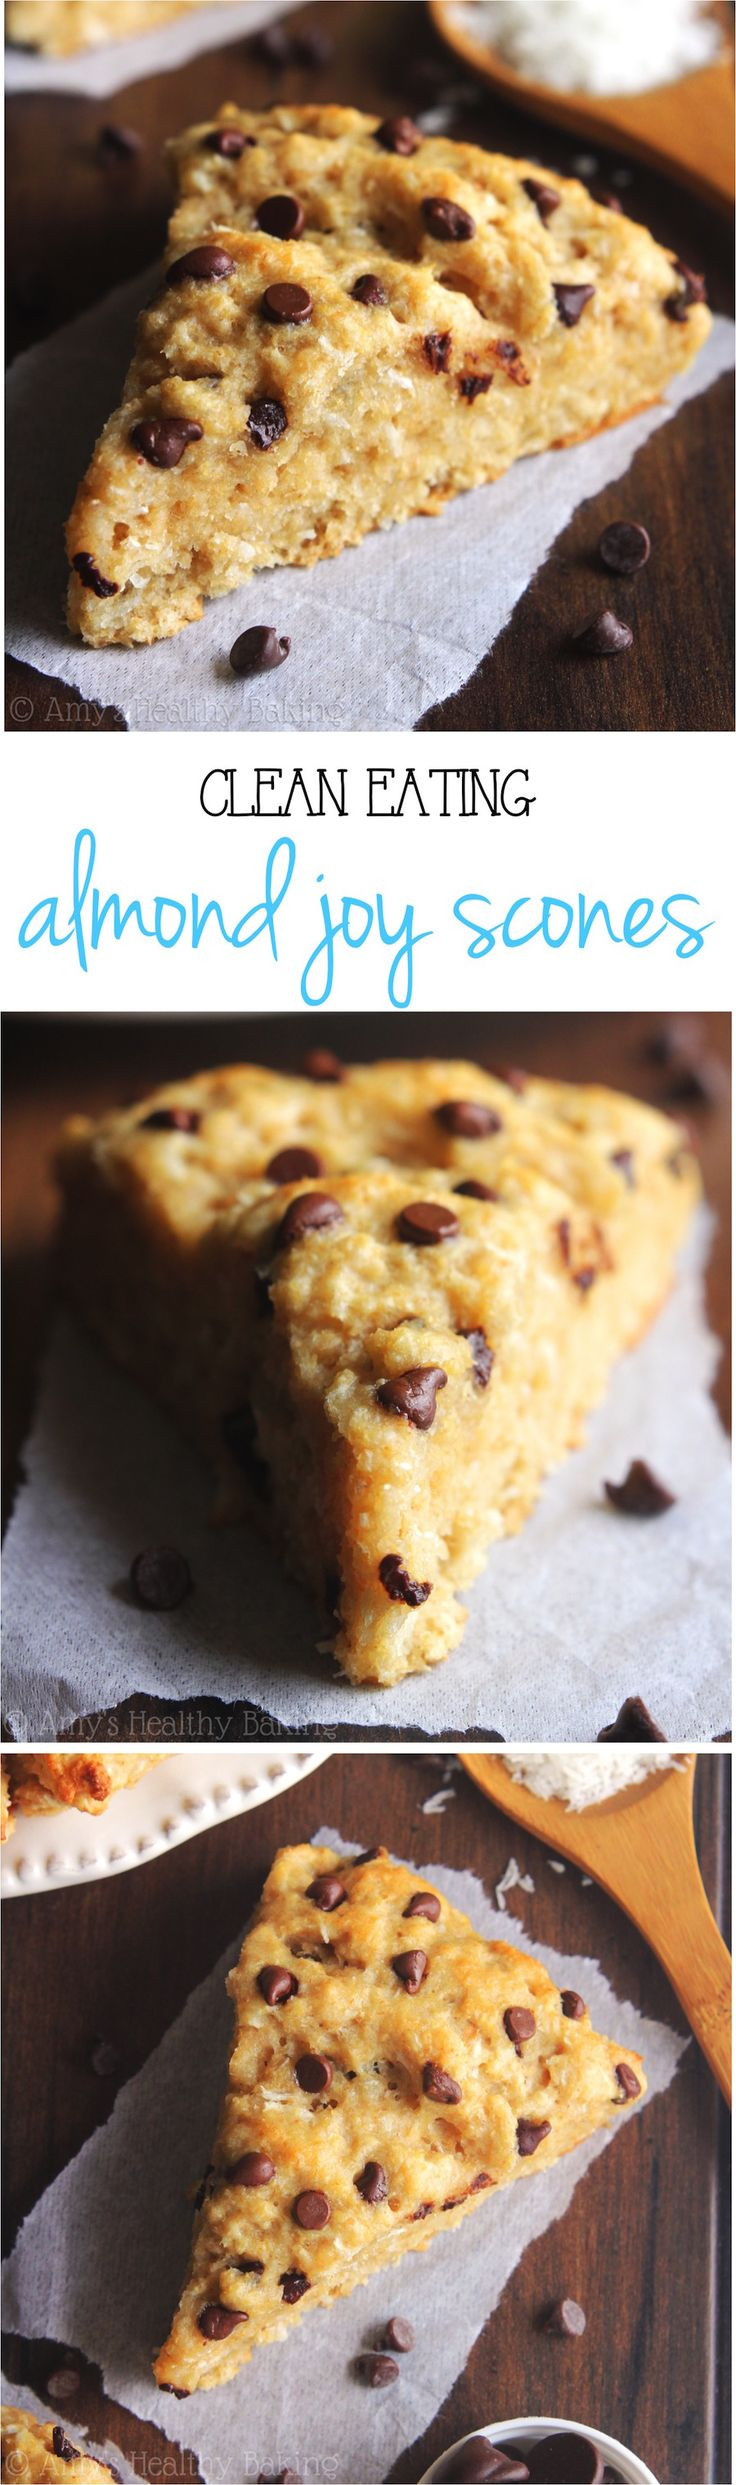 Breakfast Scones Healthy  Easy Healthy Breakfast Ideas Clean Eating Almond Joy